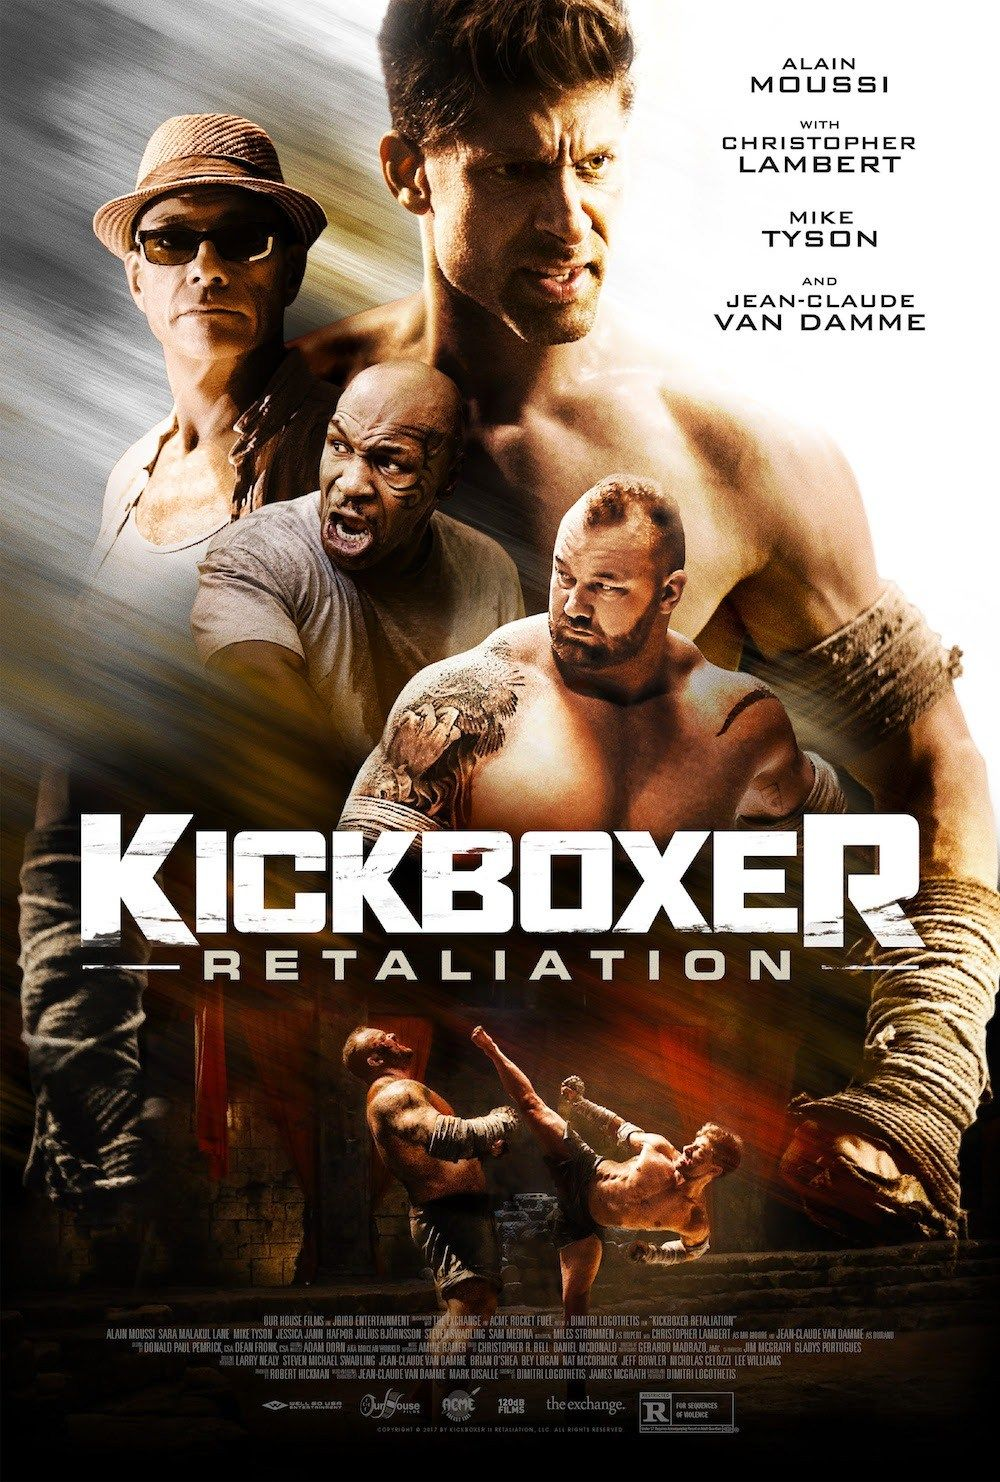 Kickboxer 2 Full Movies Streaming Movies Movies Online